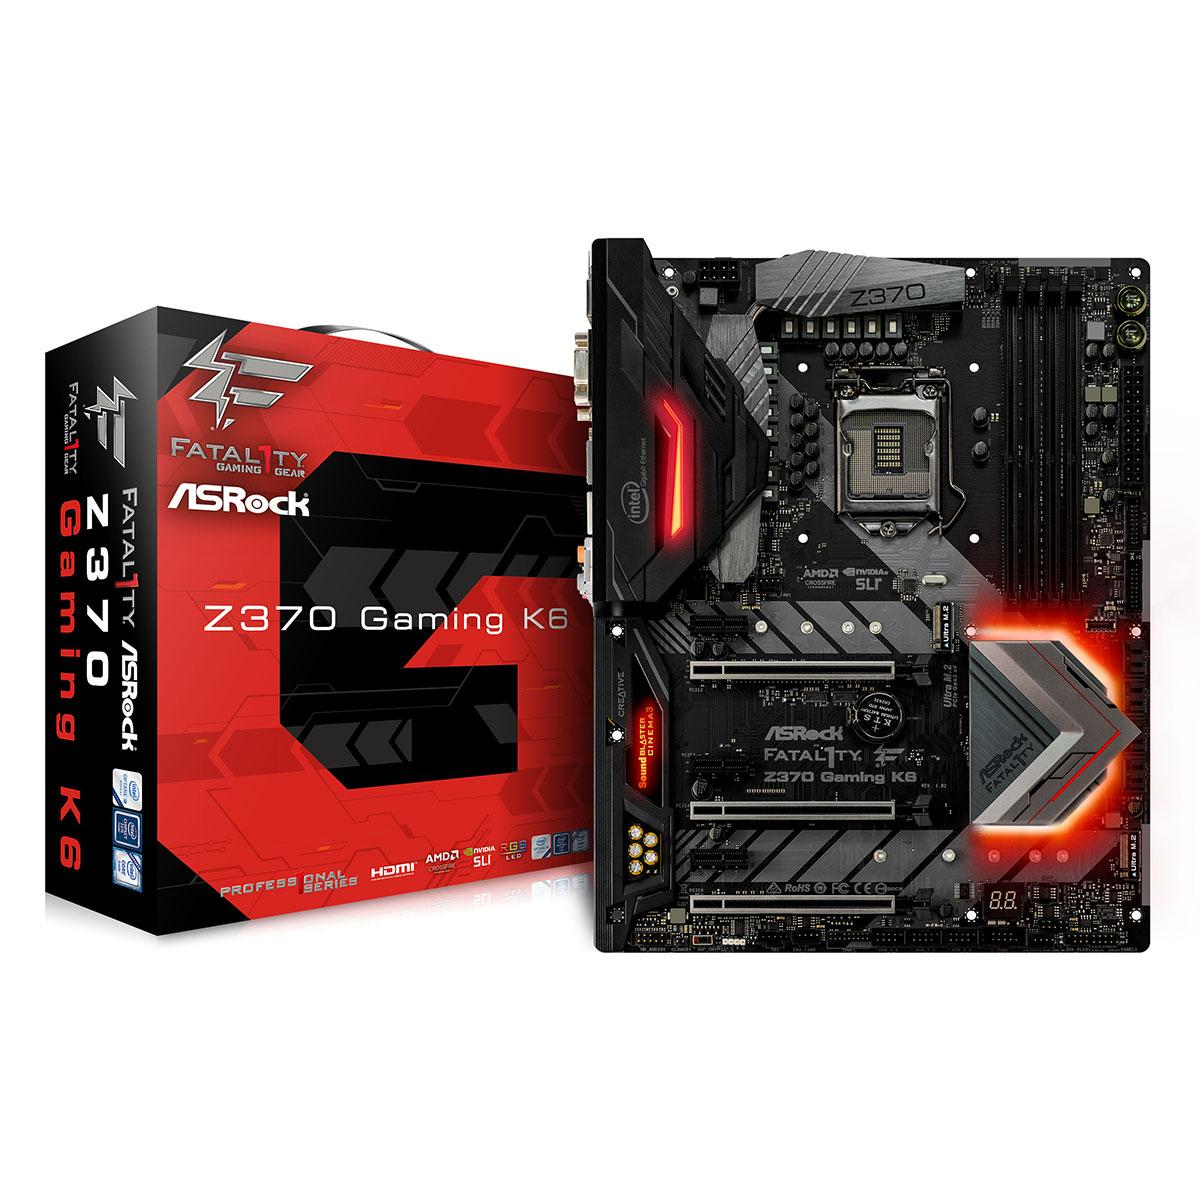 Carte mère ASRock Fatal1ty Z370 Gaming K6 Carte mère ATX Socket 1151 Intel Z370 Express - 4x DDR4 - SATA 6Gb/s + M.2 - USB 3.1 - 3x PCI-Express 3.0 16x